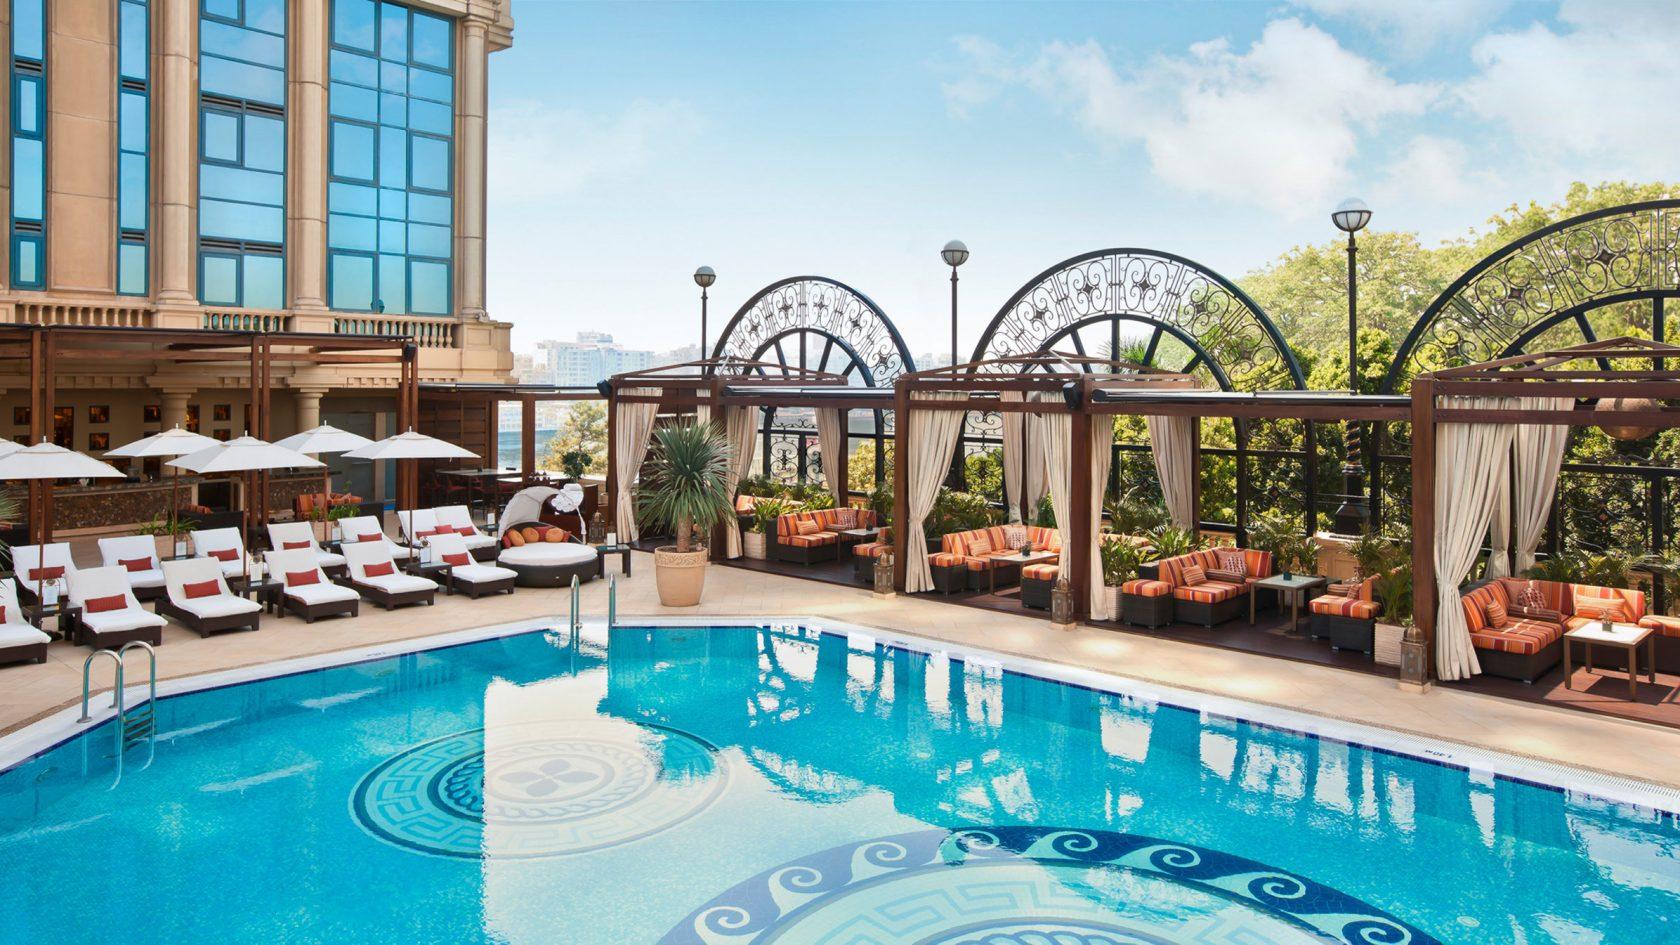 Four Seasons Resort at Kuda Huraa